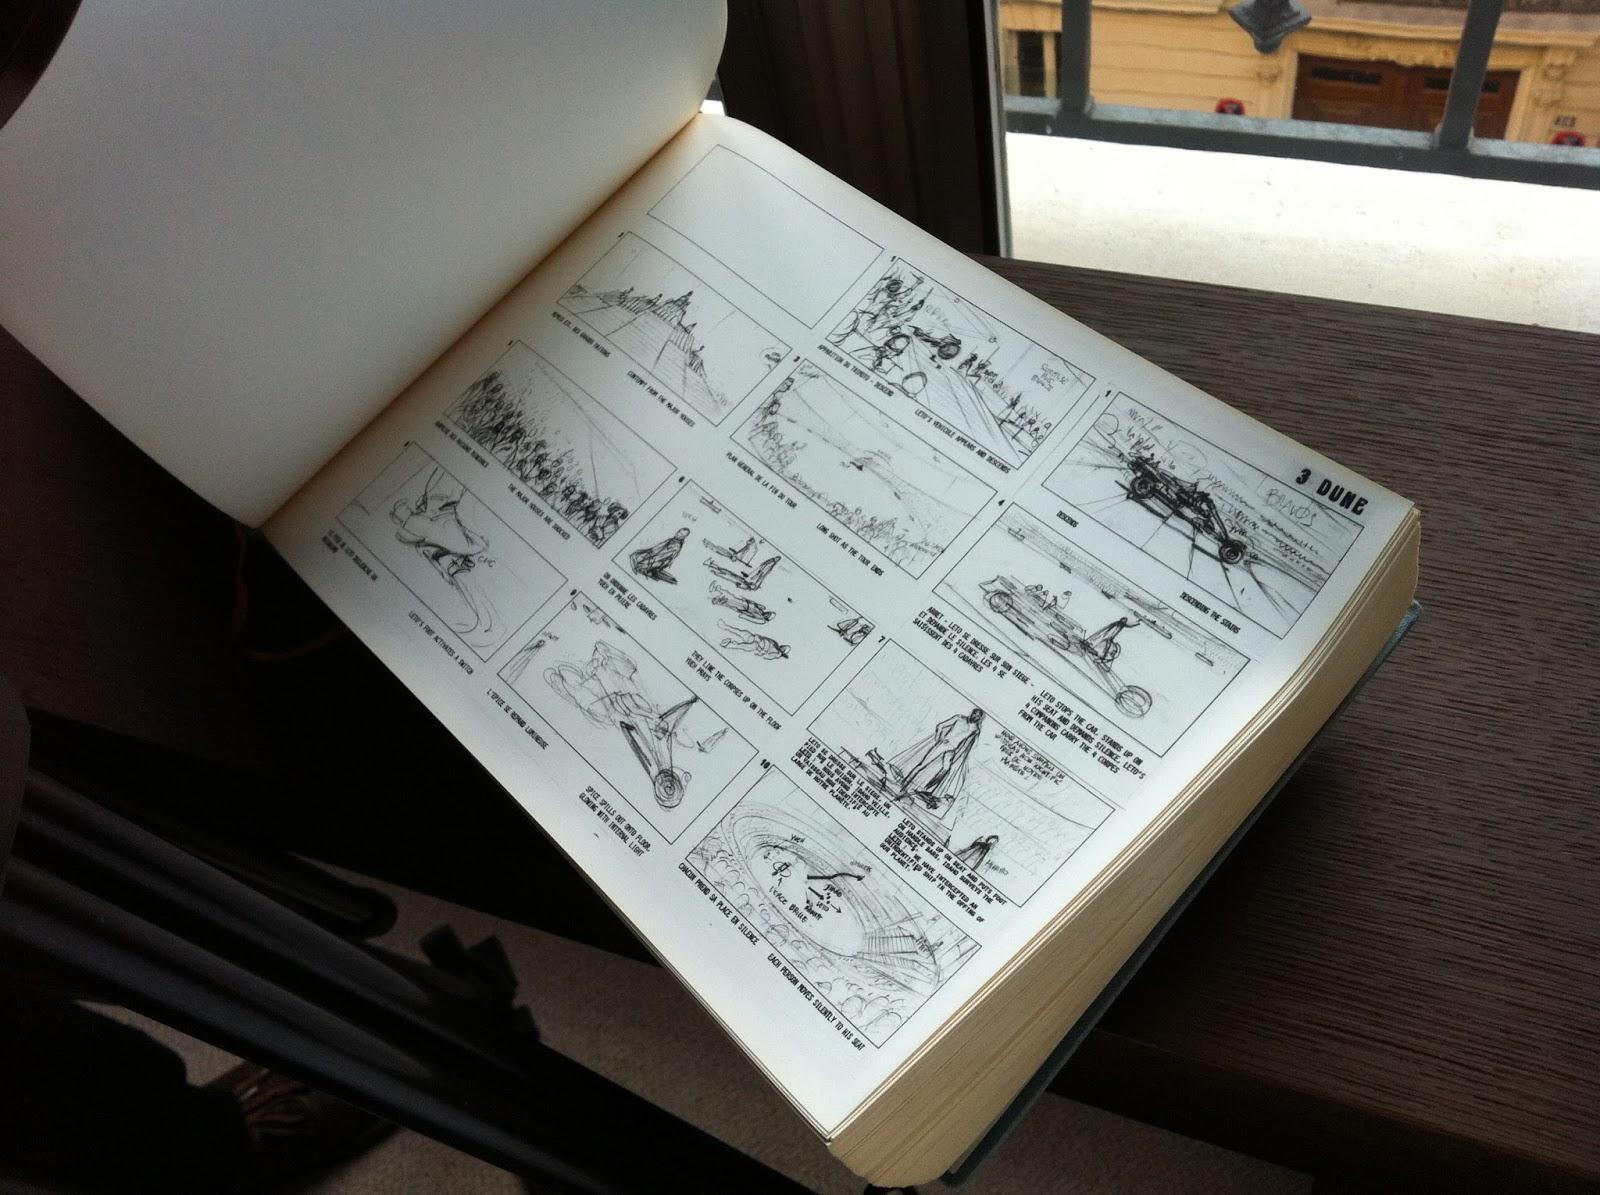 making comics scott mccloud pdf free download